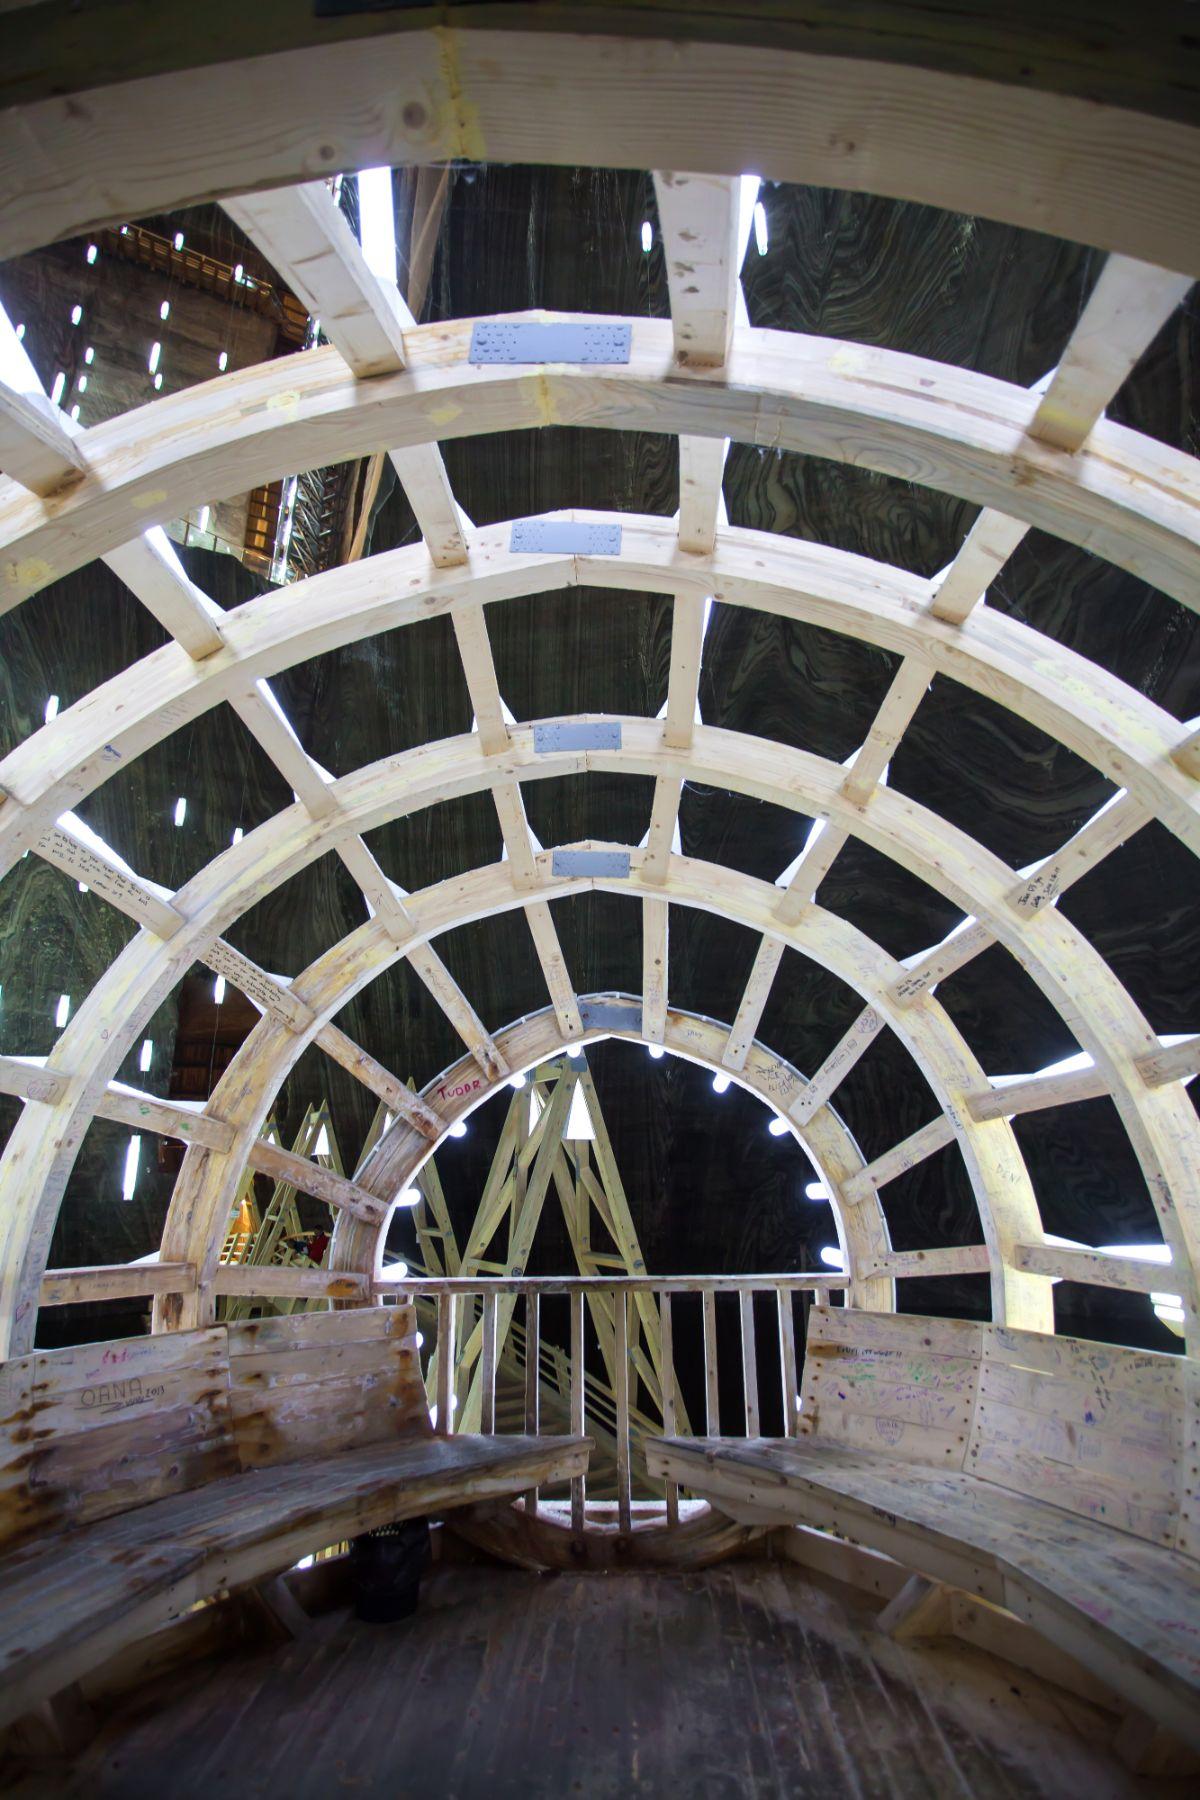 Spaceship Frame